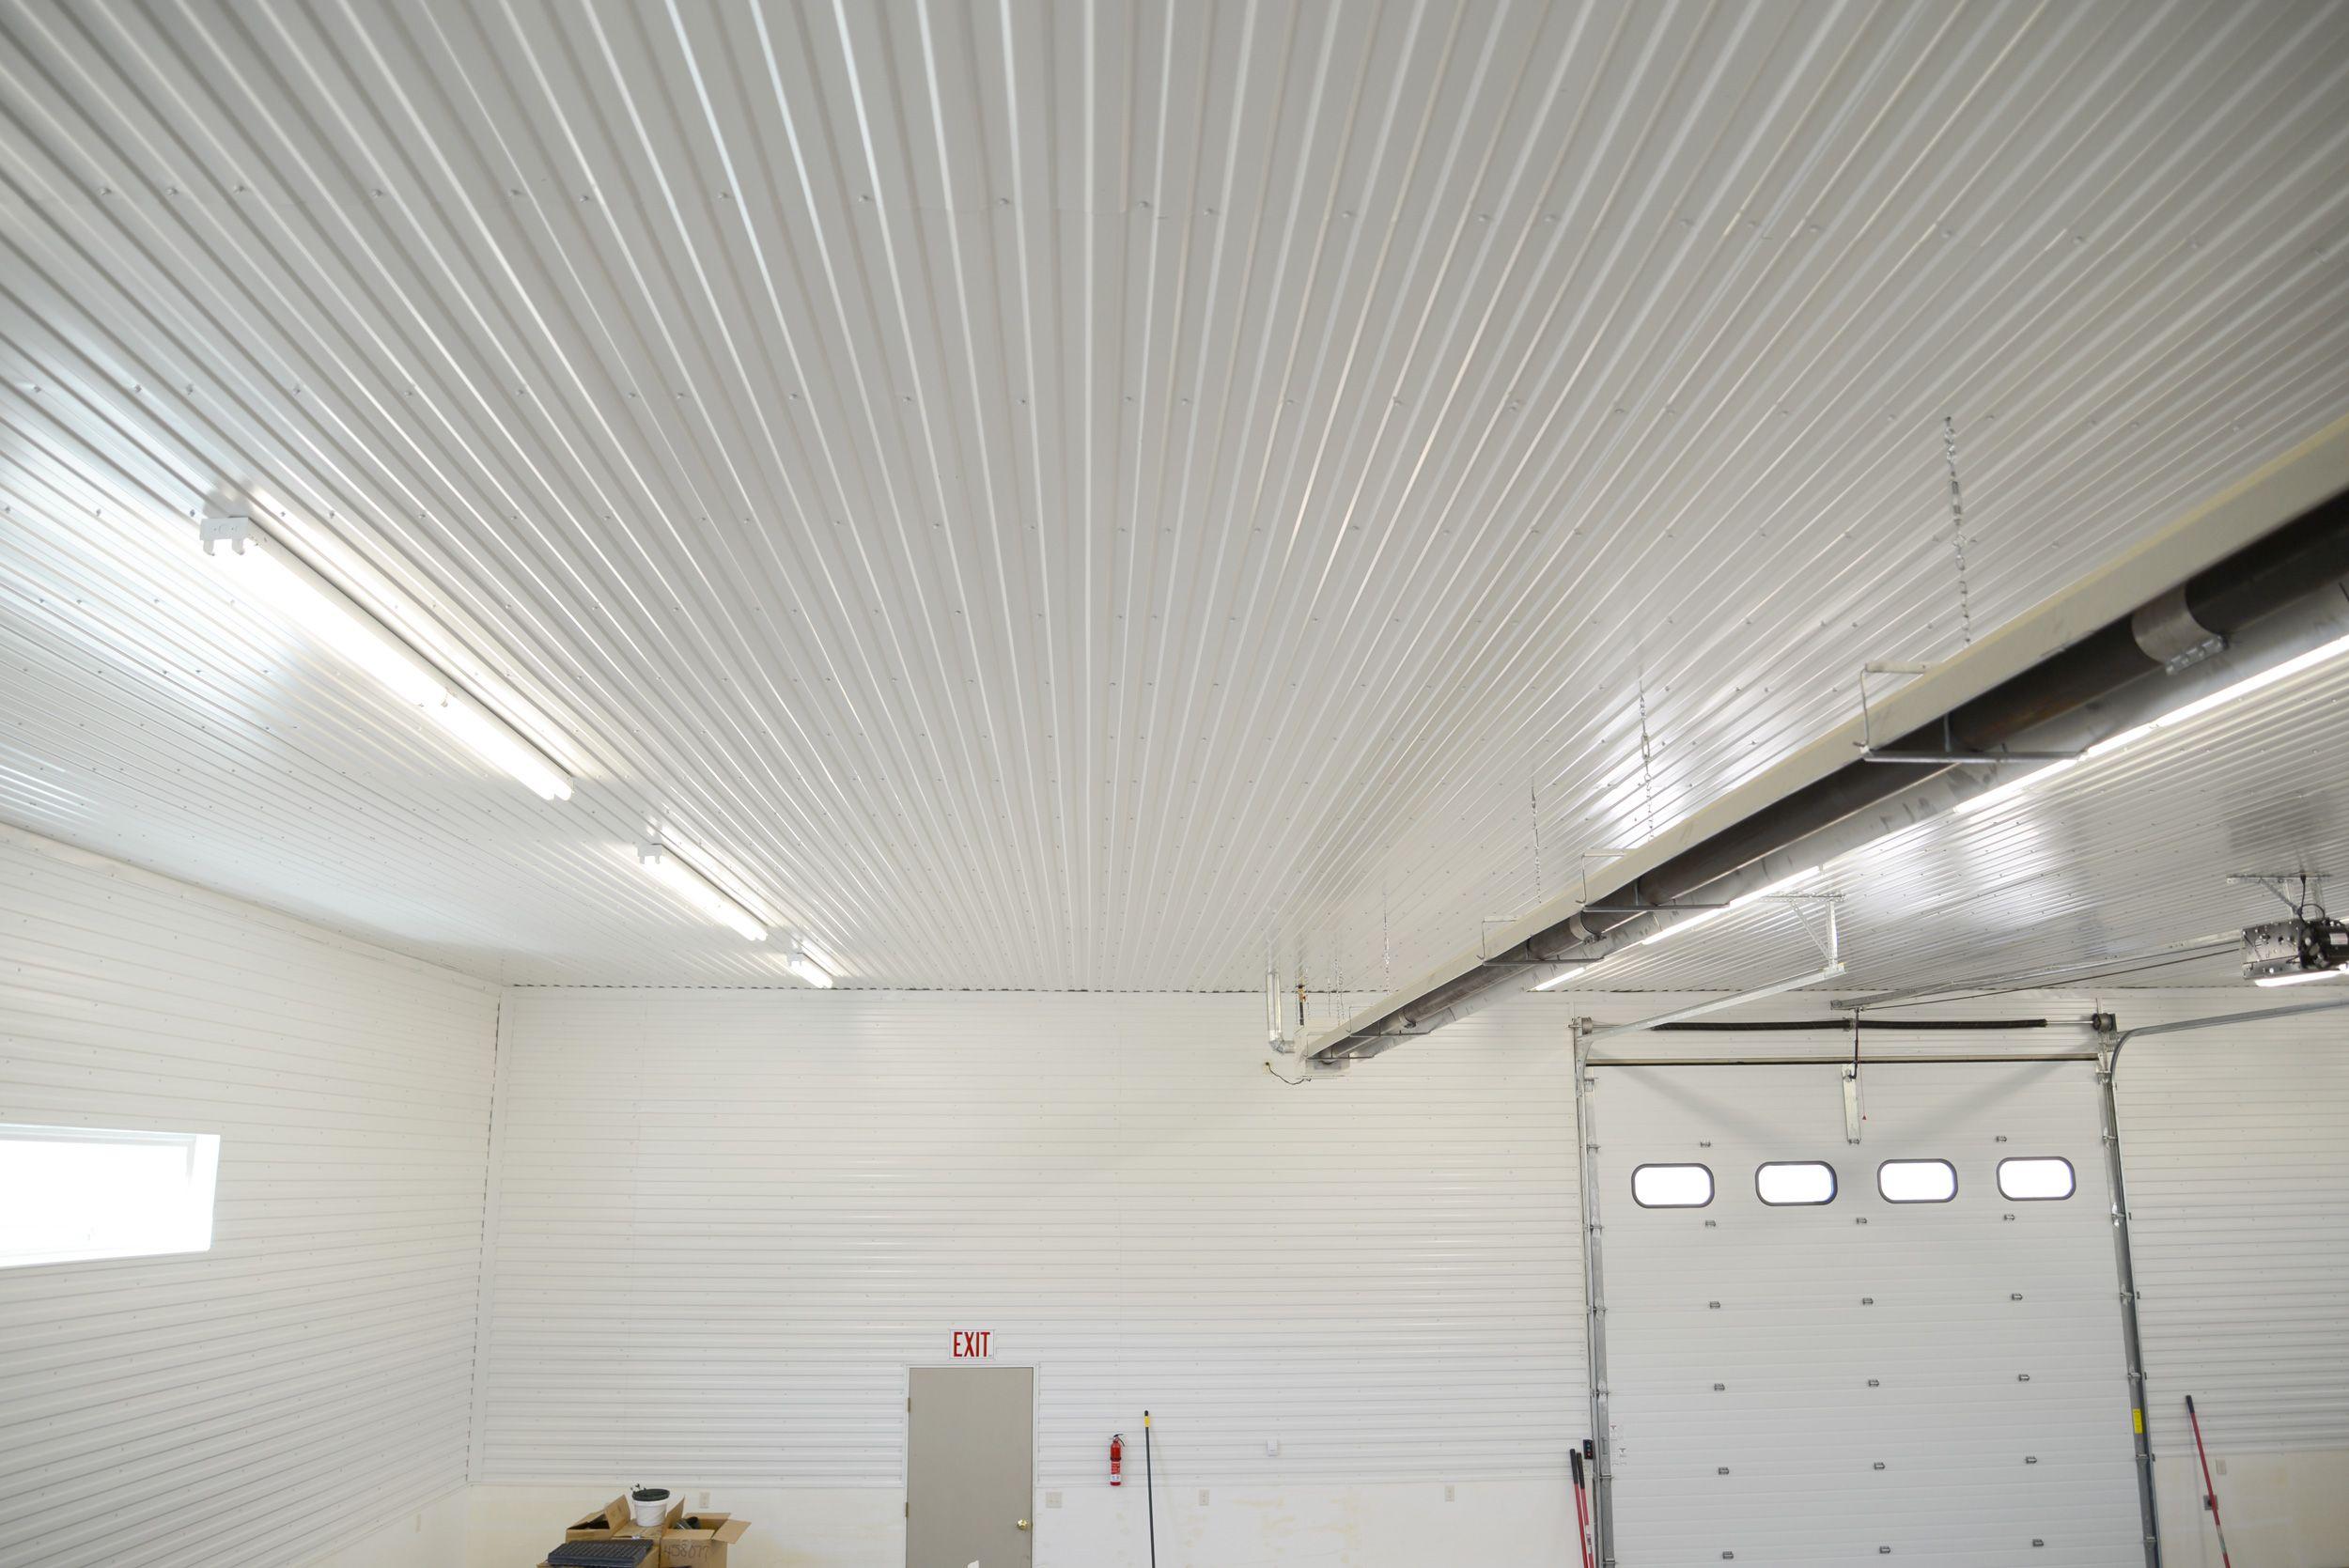 Sandwich plafond met licht ophangen